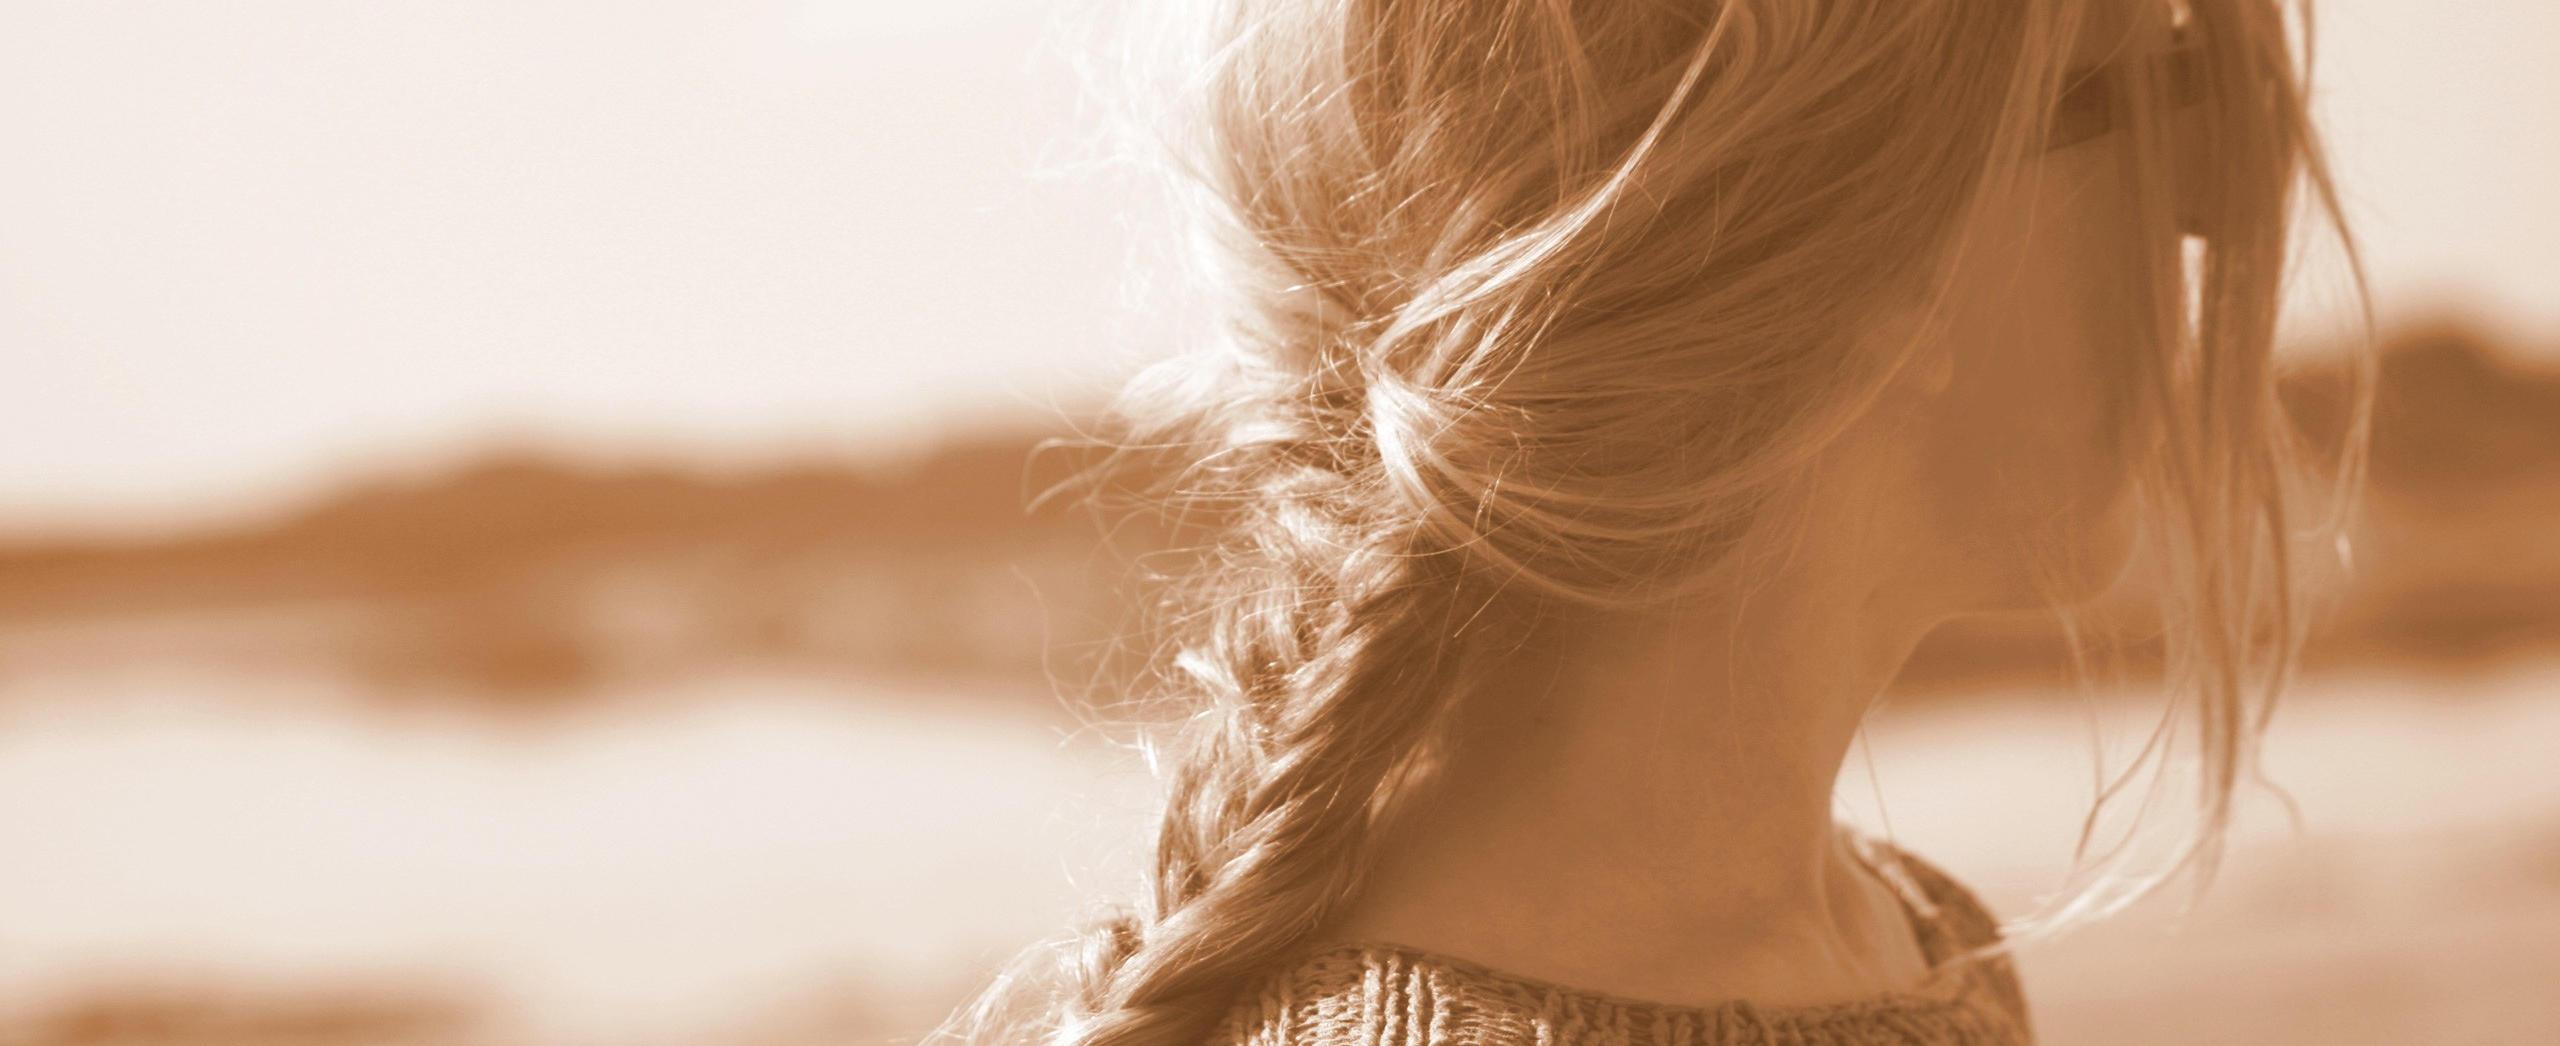 Scalp Pain And Hair Loss Natural Treatment